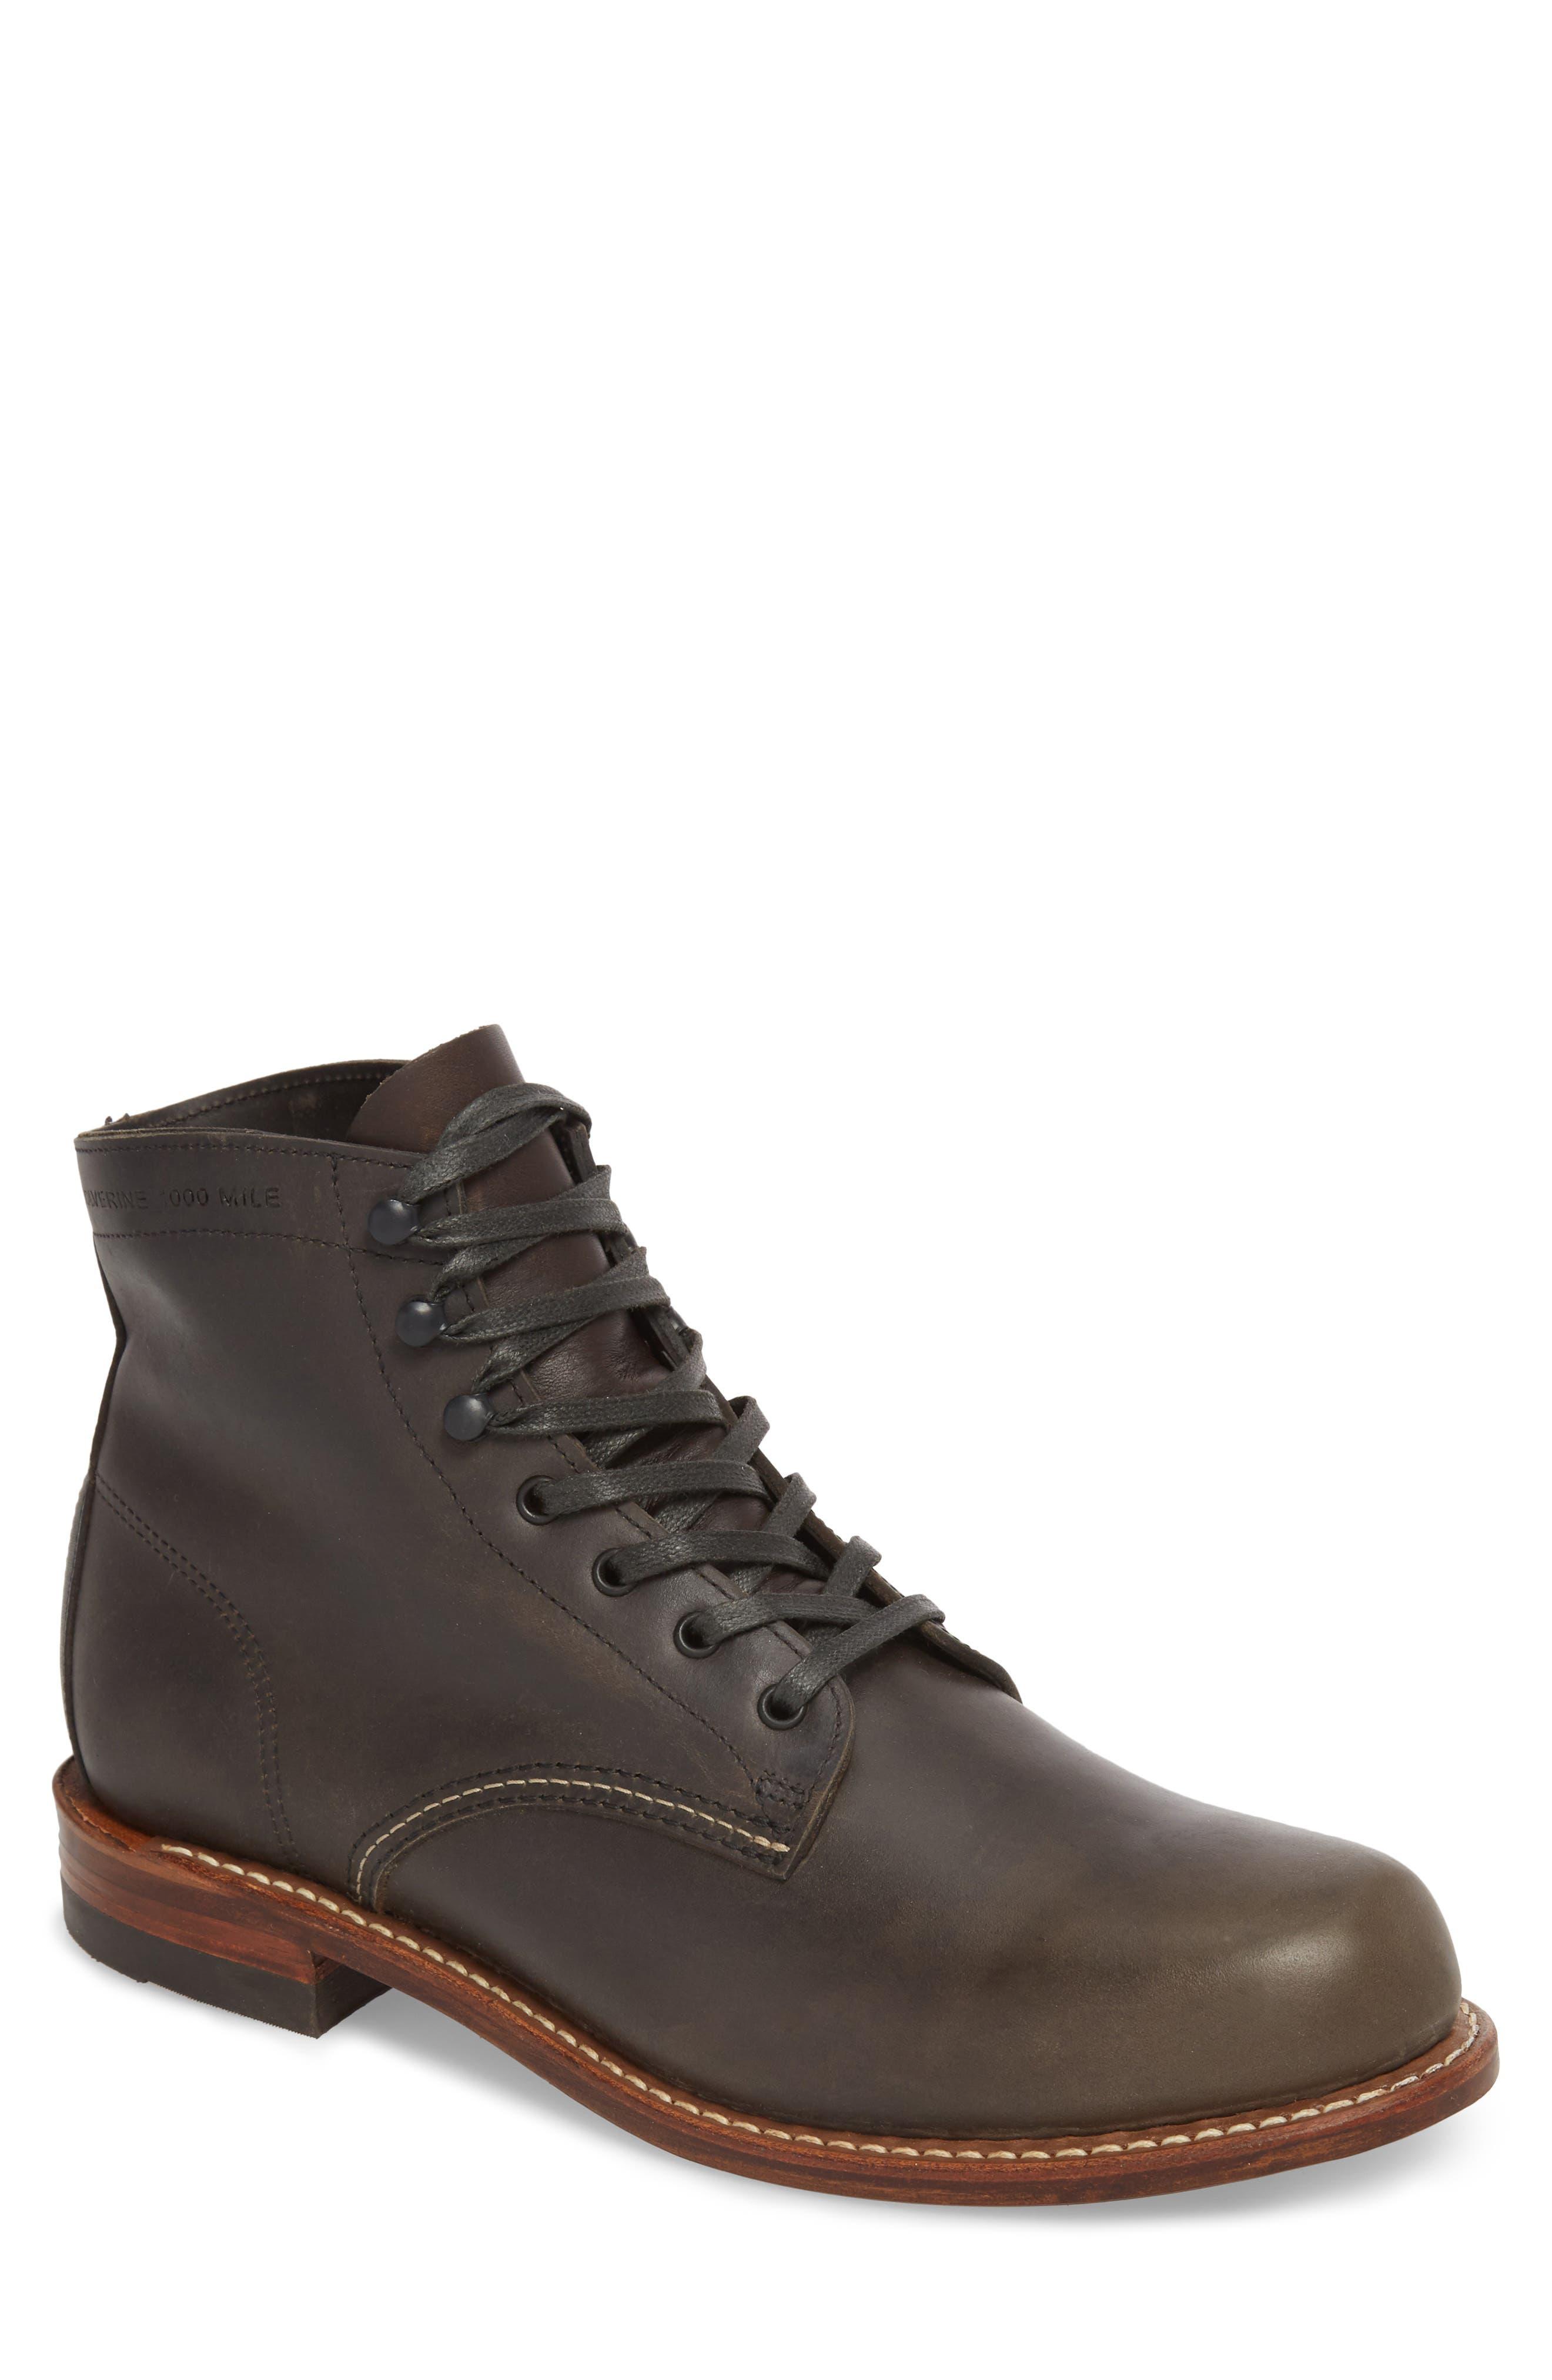 '1000 Mile' Plain Toe Boot,                         Main,                         color, Charcoal